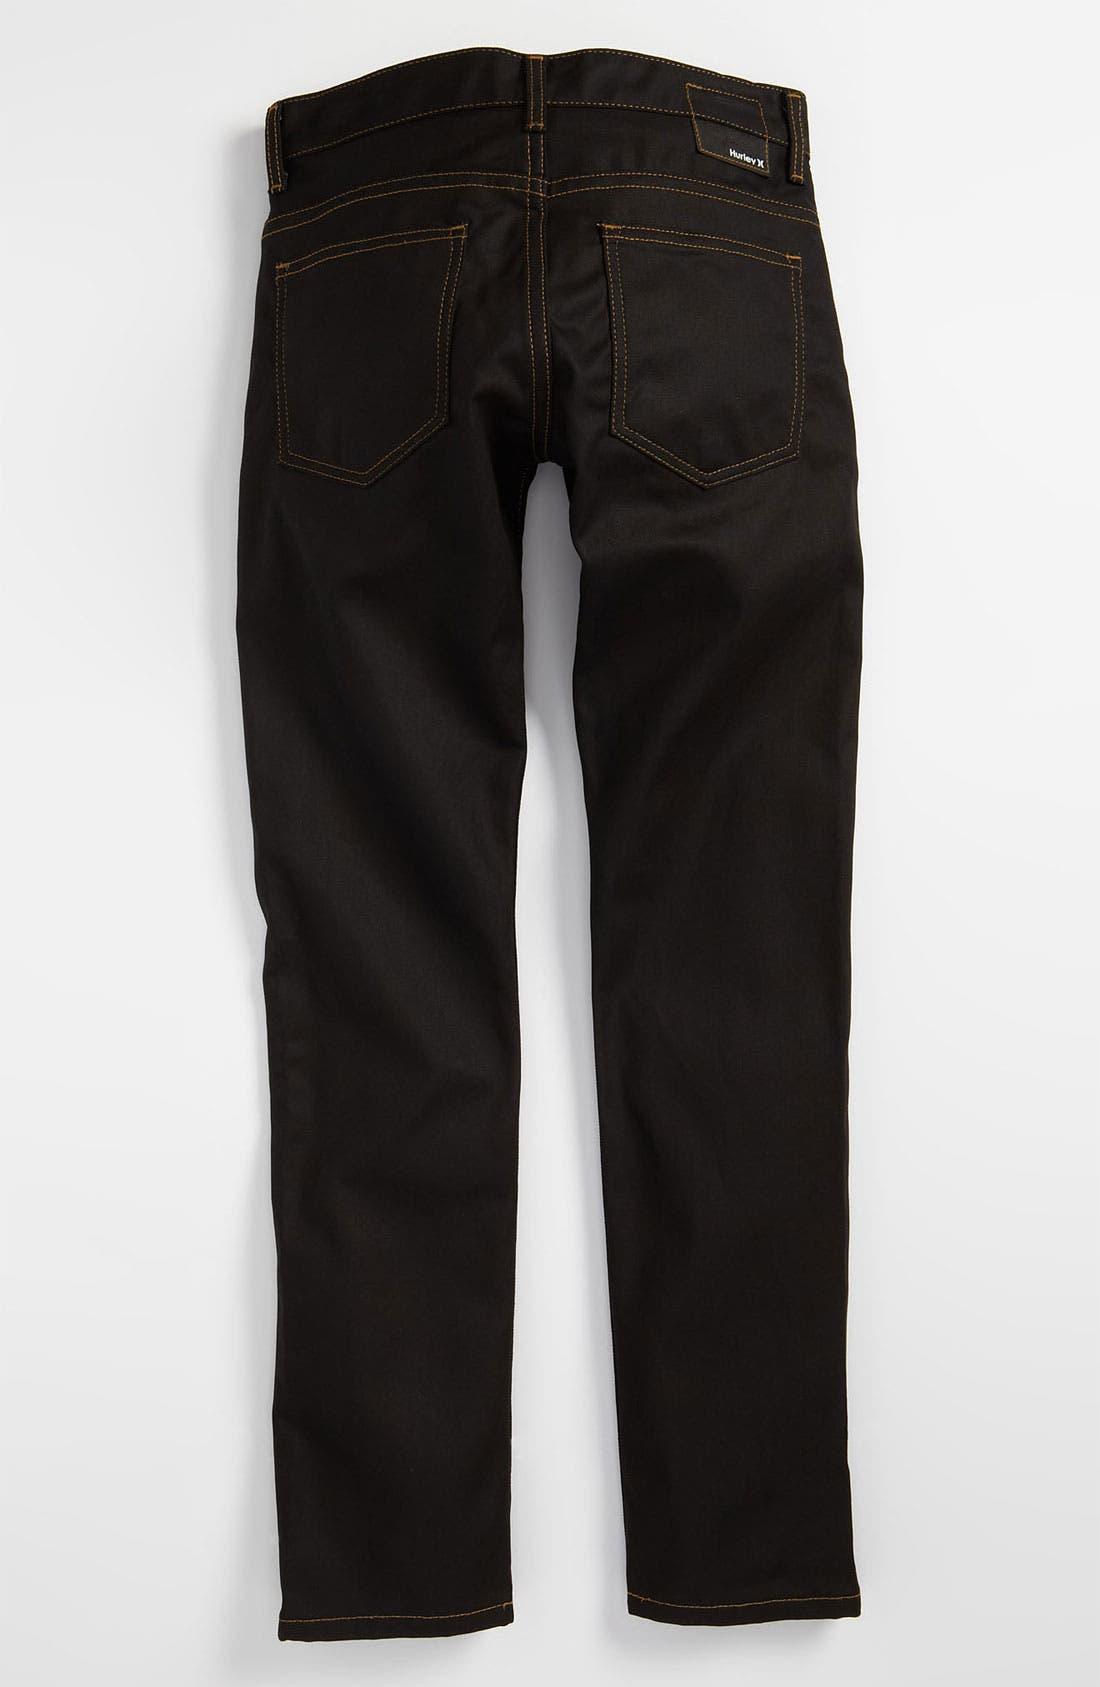 Alternate Image 1 Selected - Hurley '79' Jeans (Big Boys)